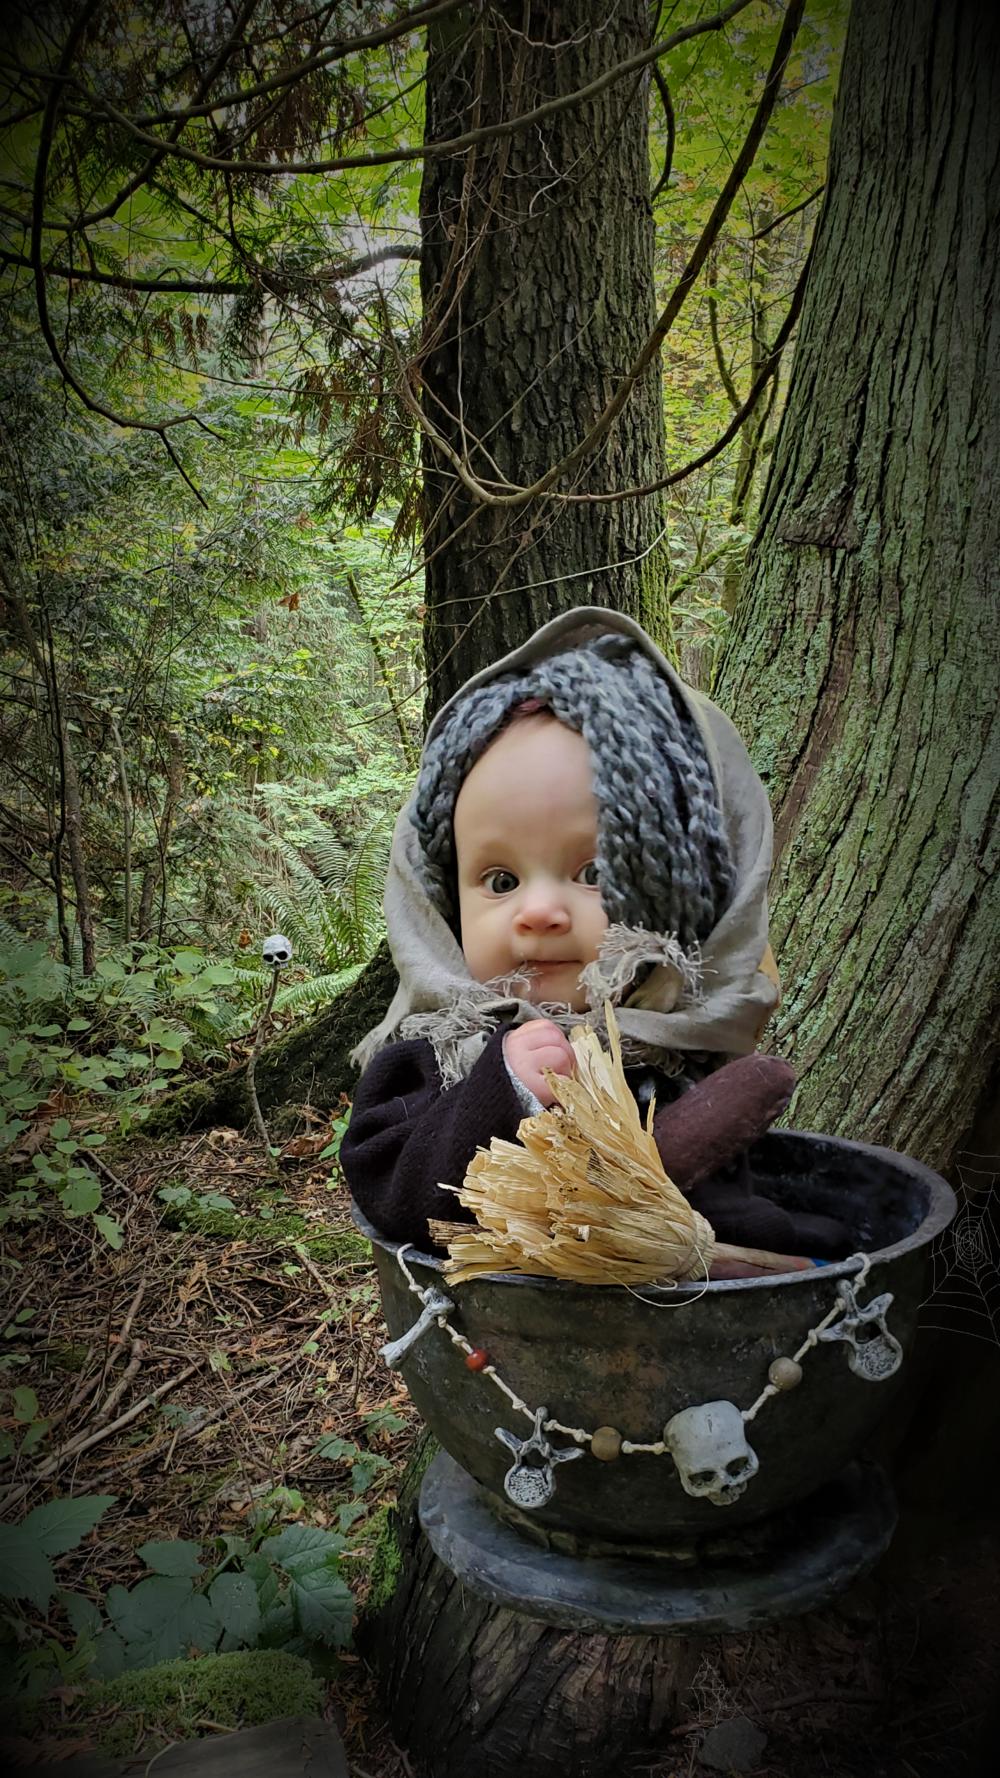 Baby Baba Yaga in mortar flying in woods